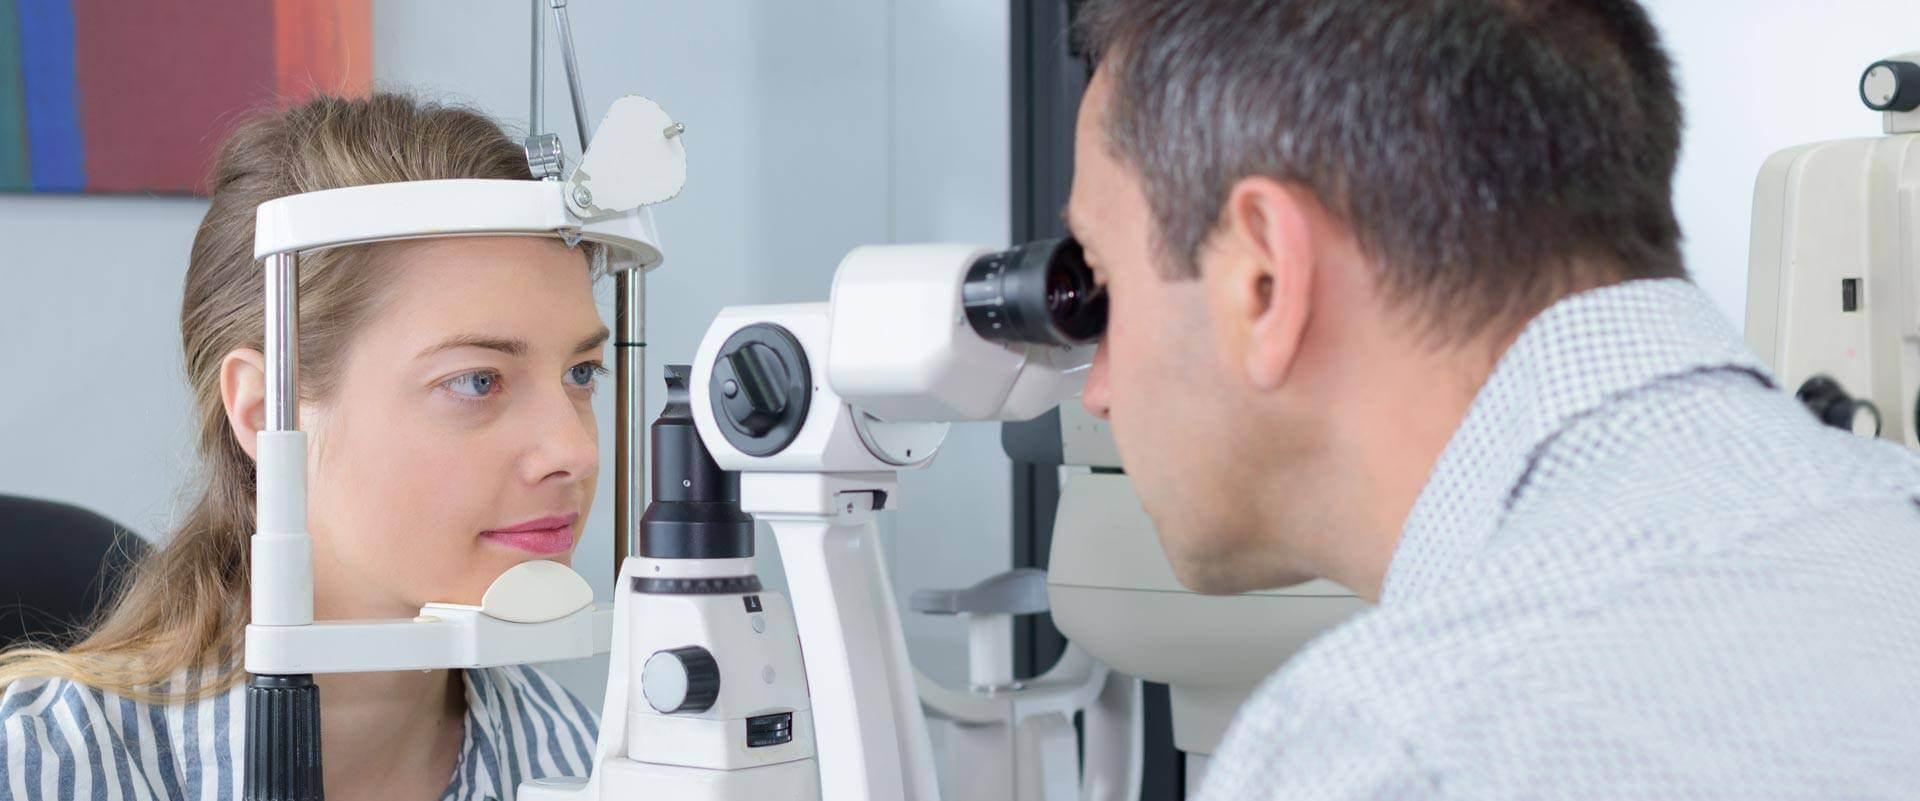 oftalmologos chile por ubicacion